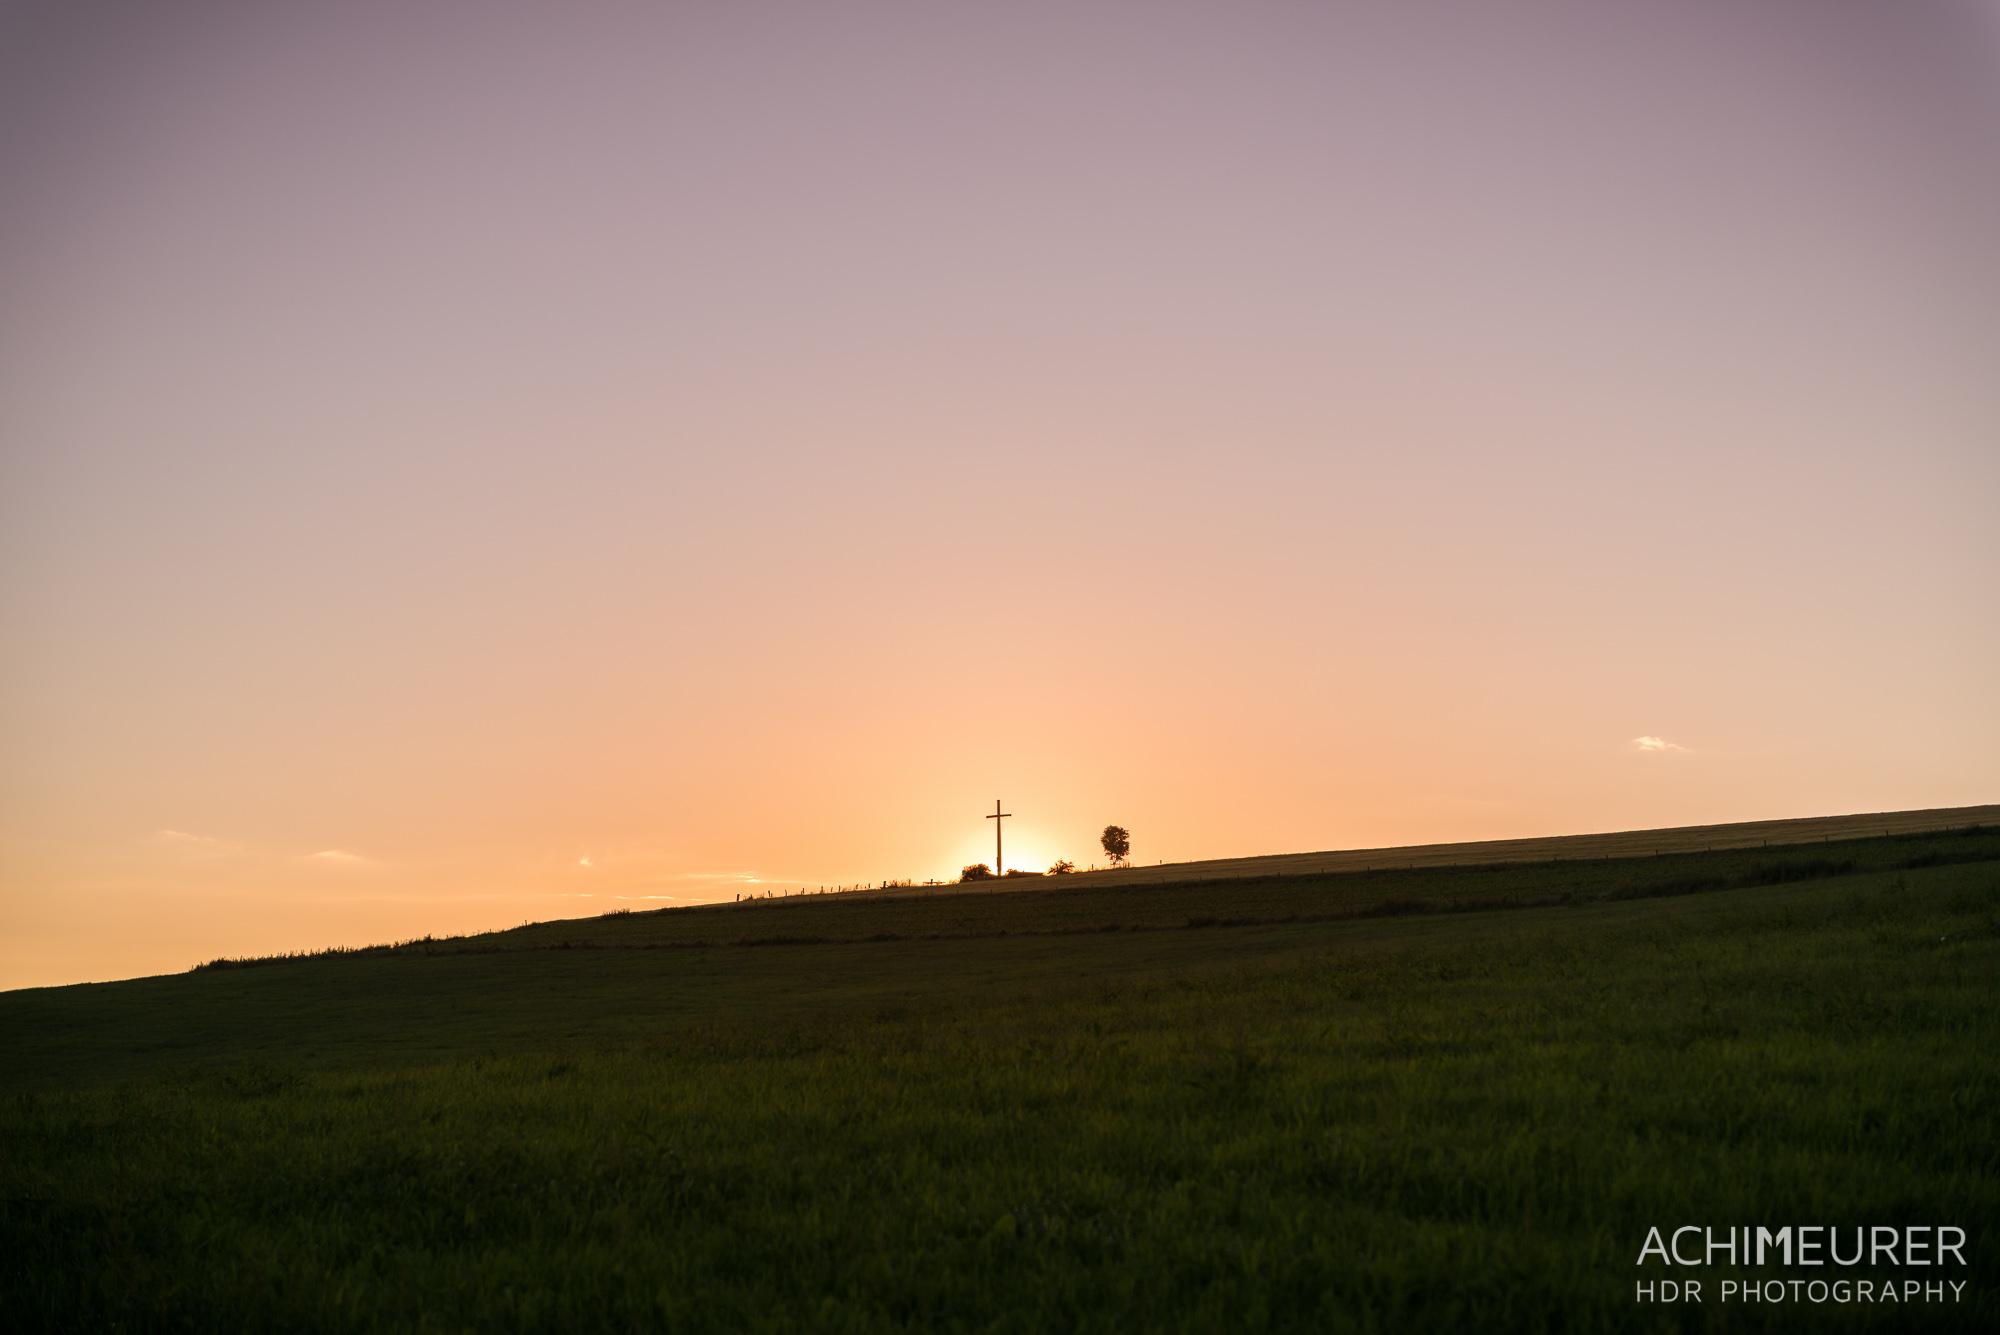 Eifel-Rheinland-Pfalz_5255